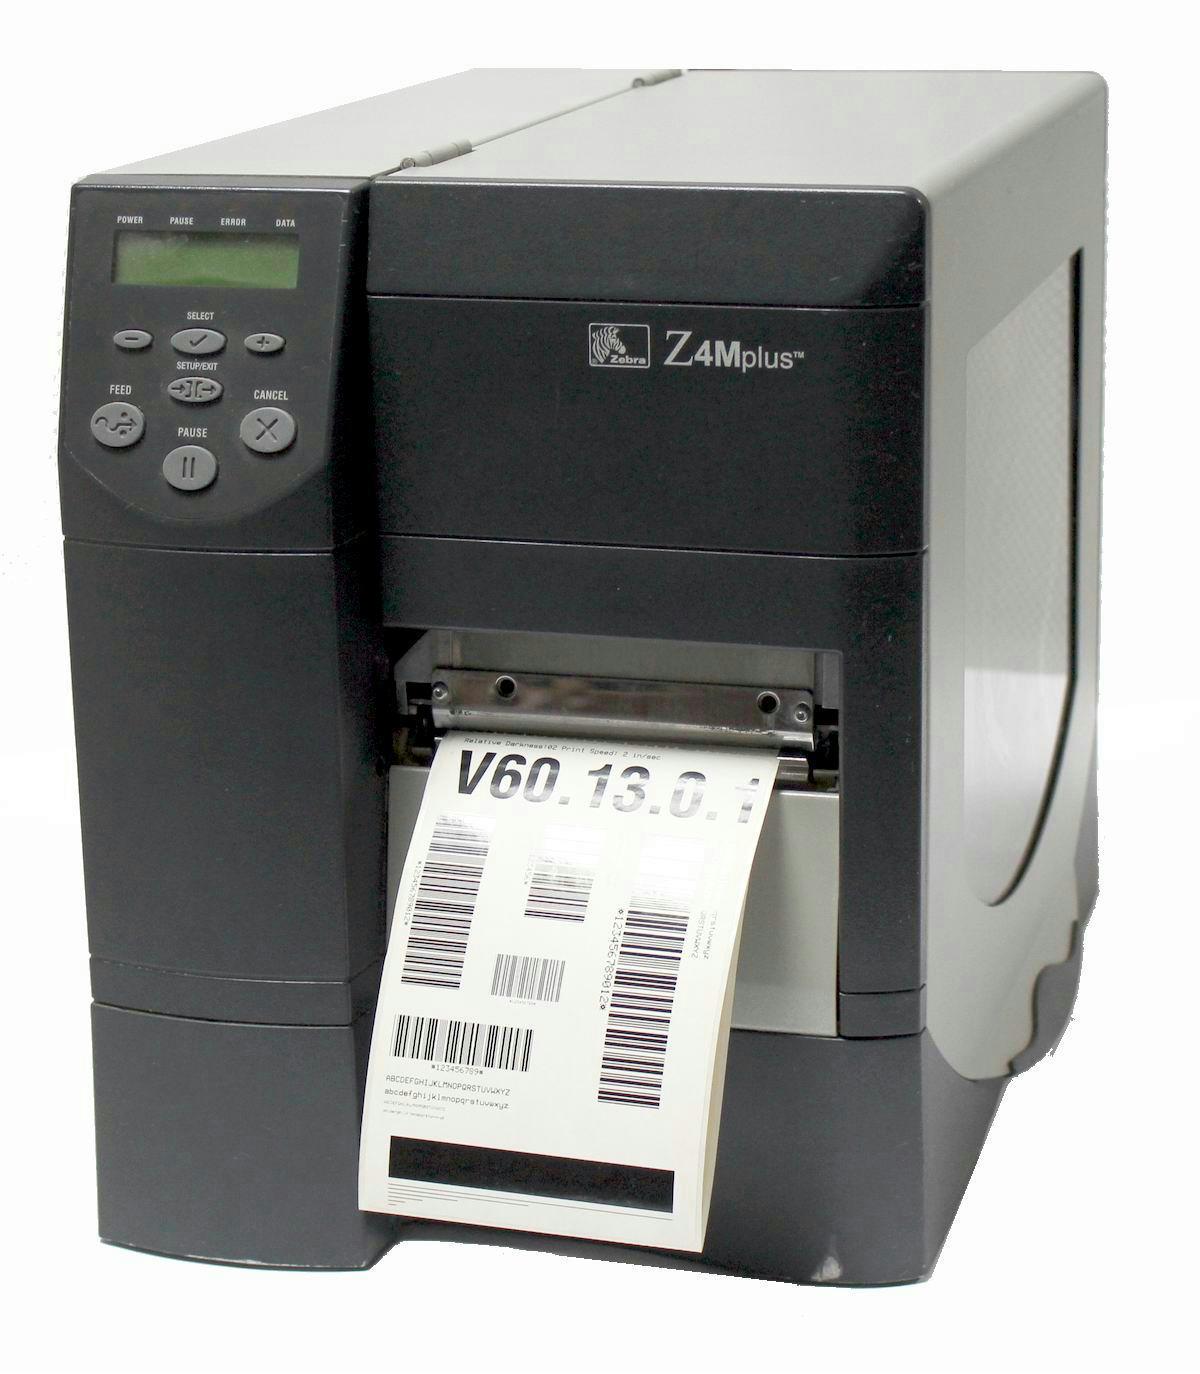 Details about Zebra Z4M Plus Z4M00-2201-0020 TT/DT Barcode Printer  (Parallel/Serial) 203DPI